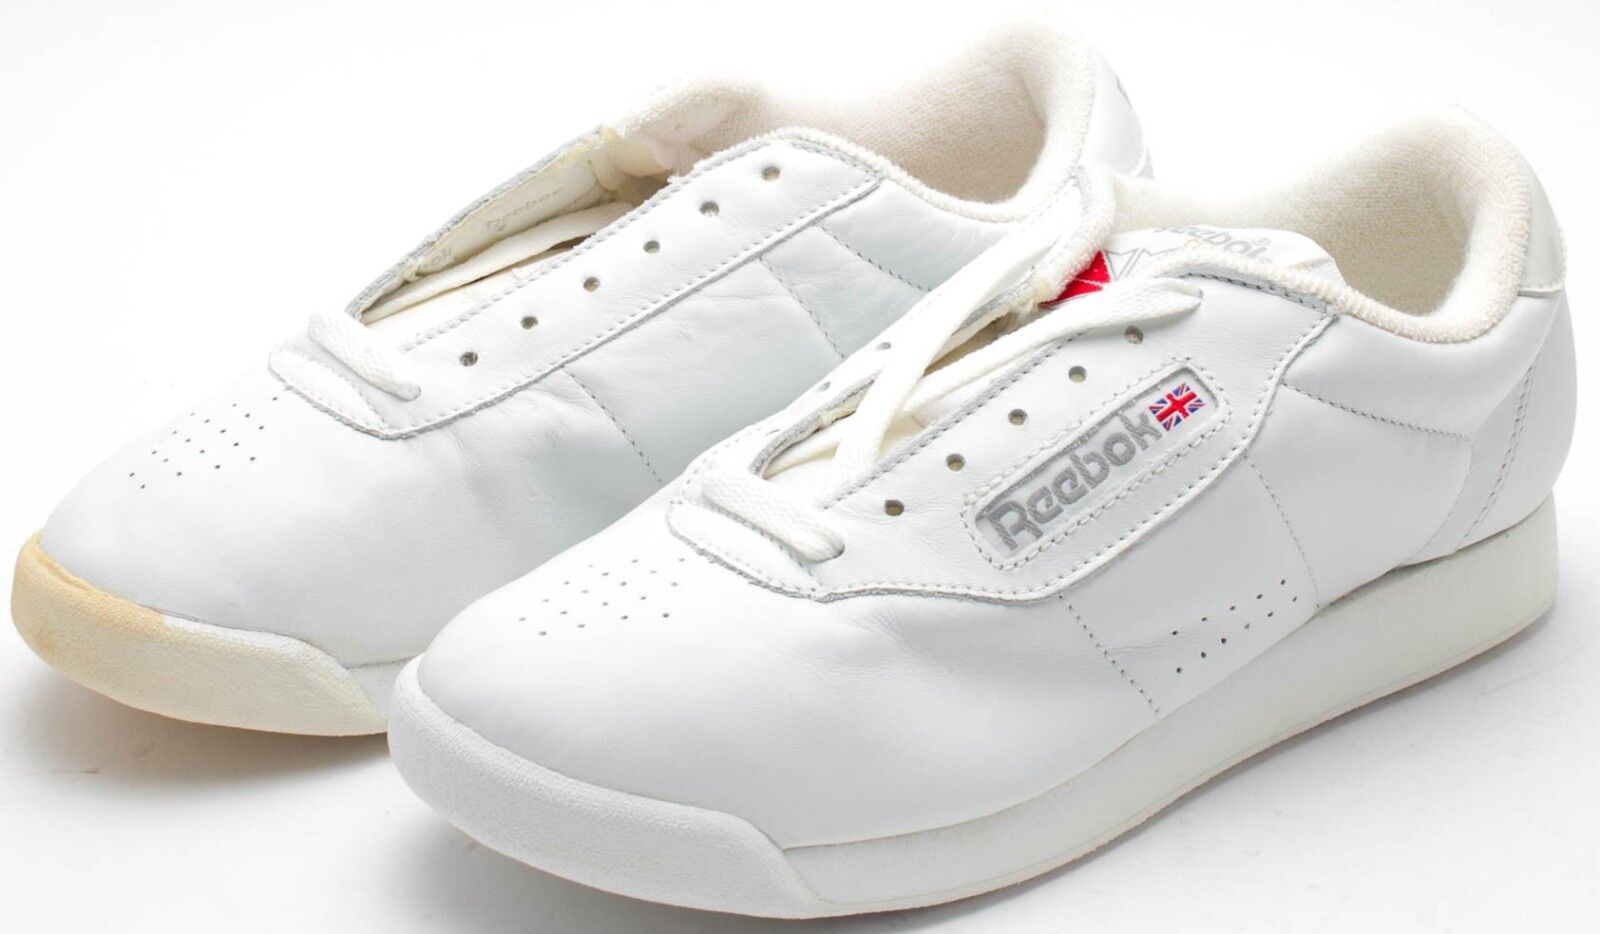 Reebok Damen Vintage 5055cms OG Prinzessin Schuhe weiß 2-1475 Größe 6 6 Größe Verfärbung deda22